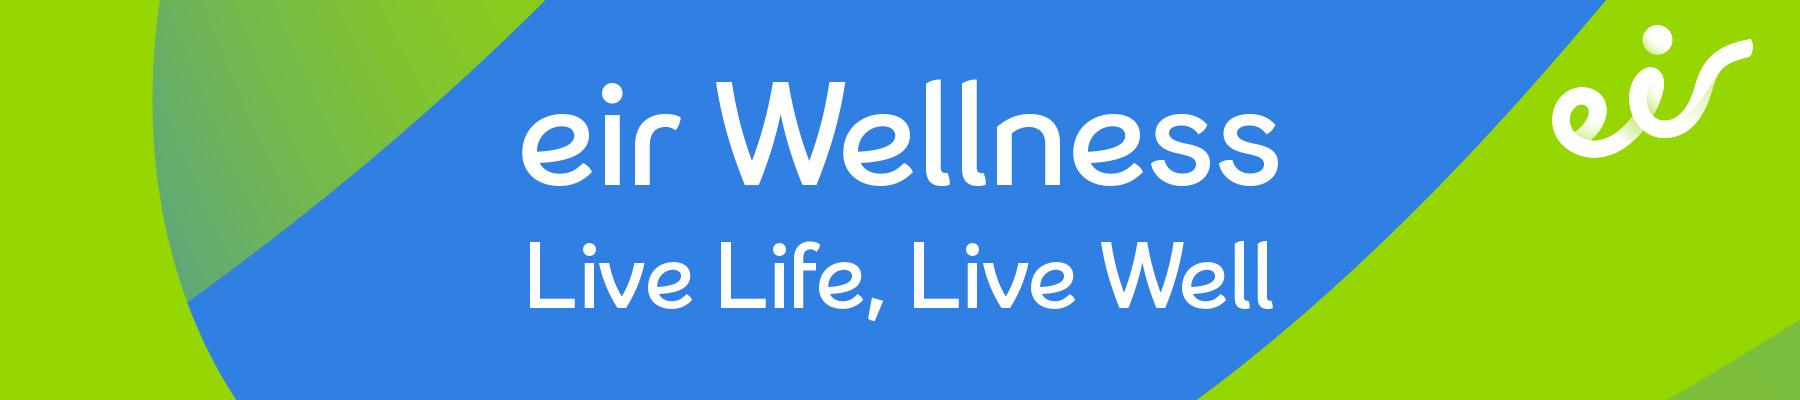 eir Wellness Banner 1800X400.jpg